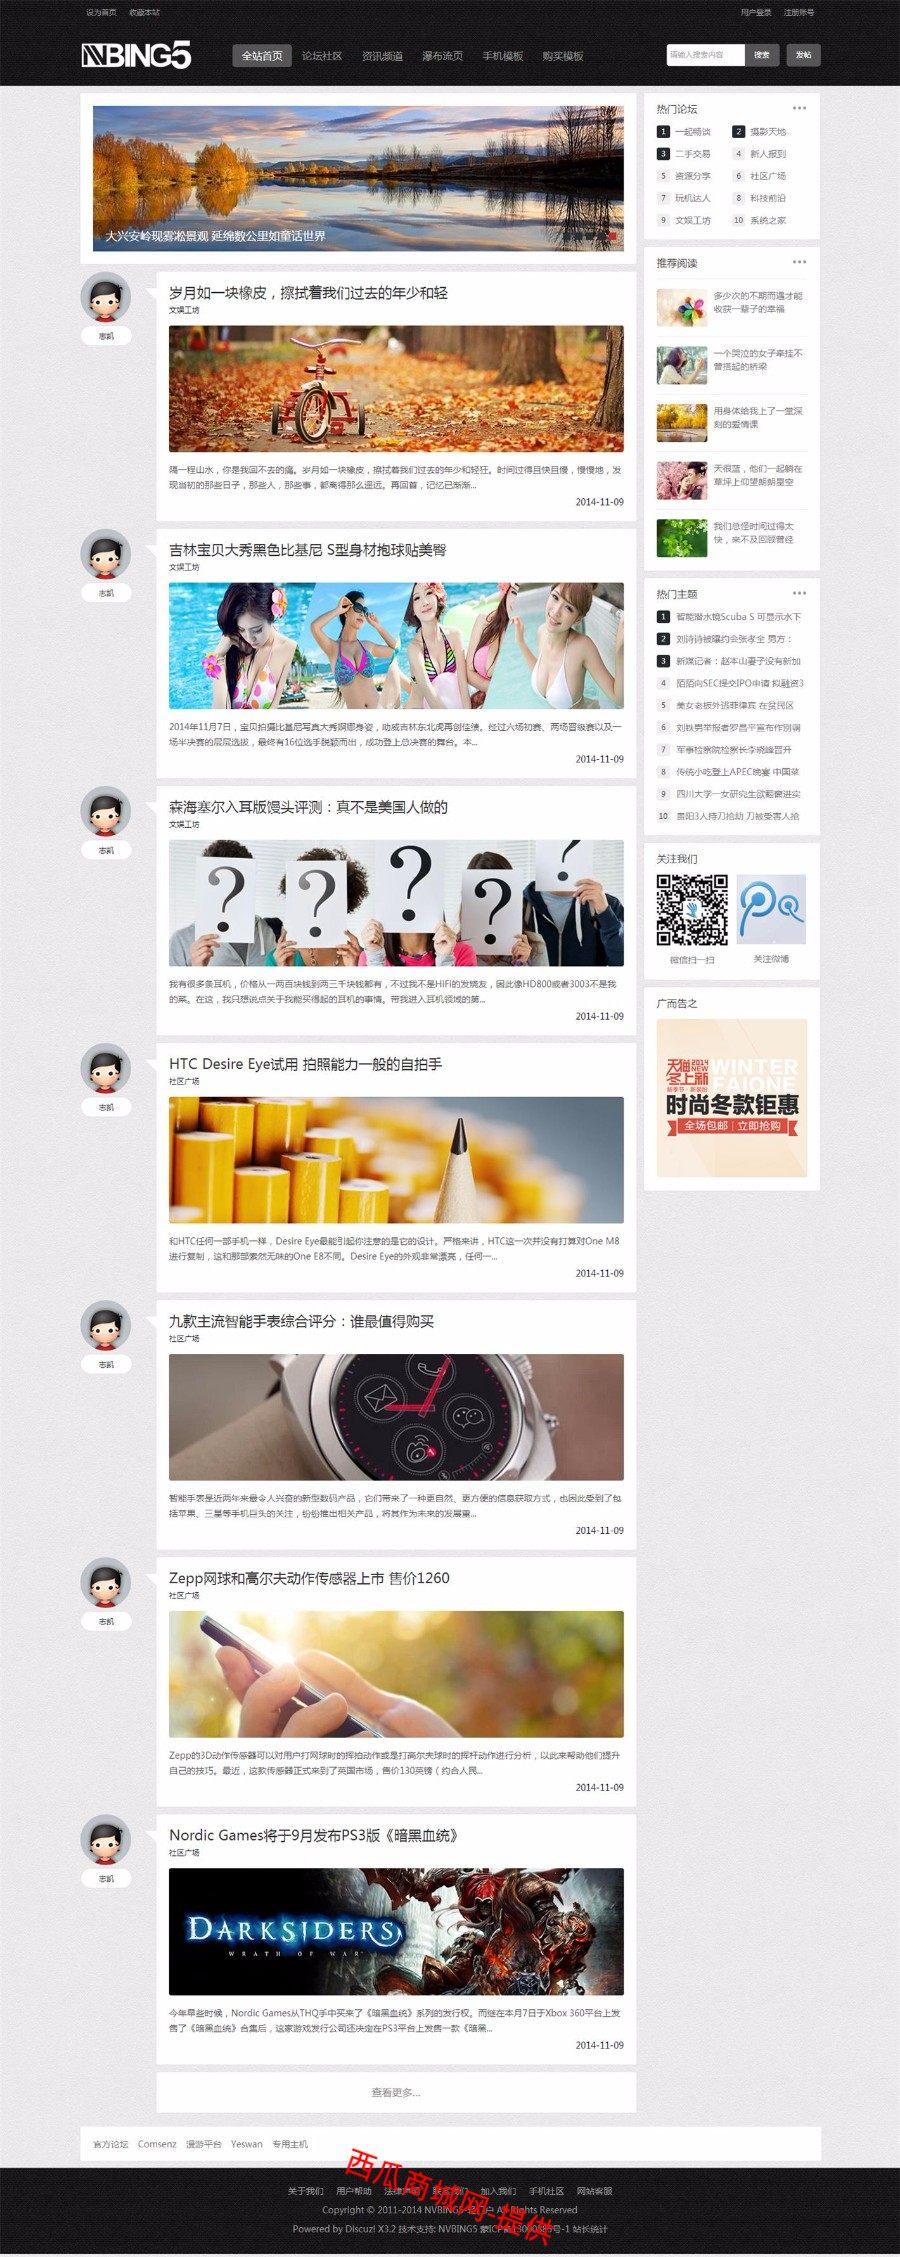 蓝点资源网-【价值300元】NVBING5-轻门户+商业版